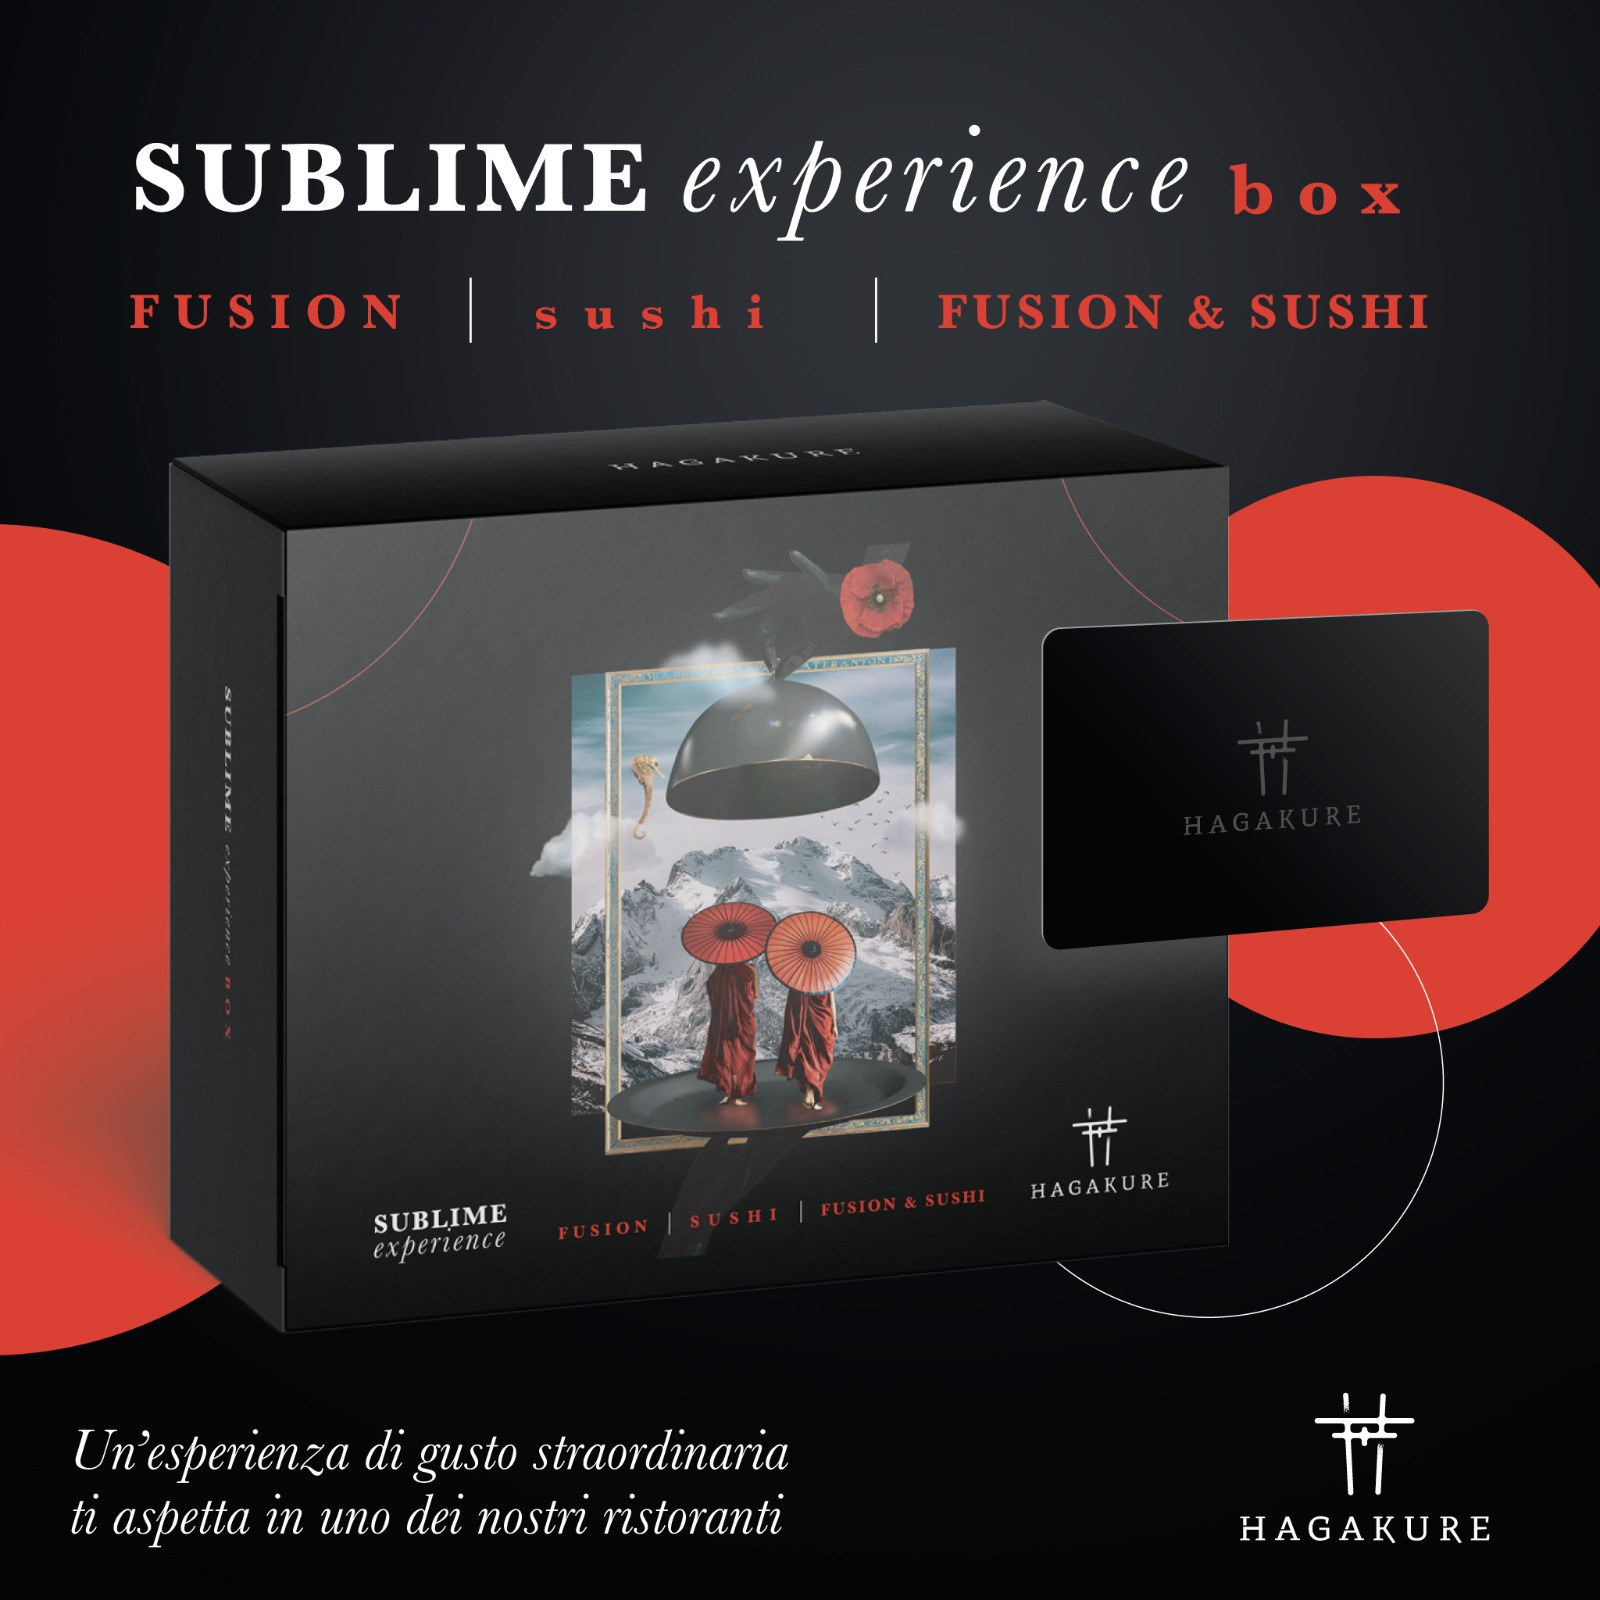 hagakure sushi fusion HAGAKURE SUBLIME EXPERIENCE - GIFT BOX